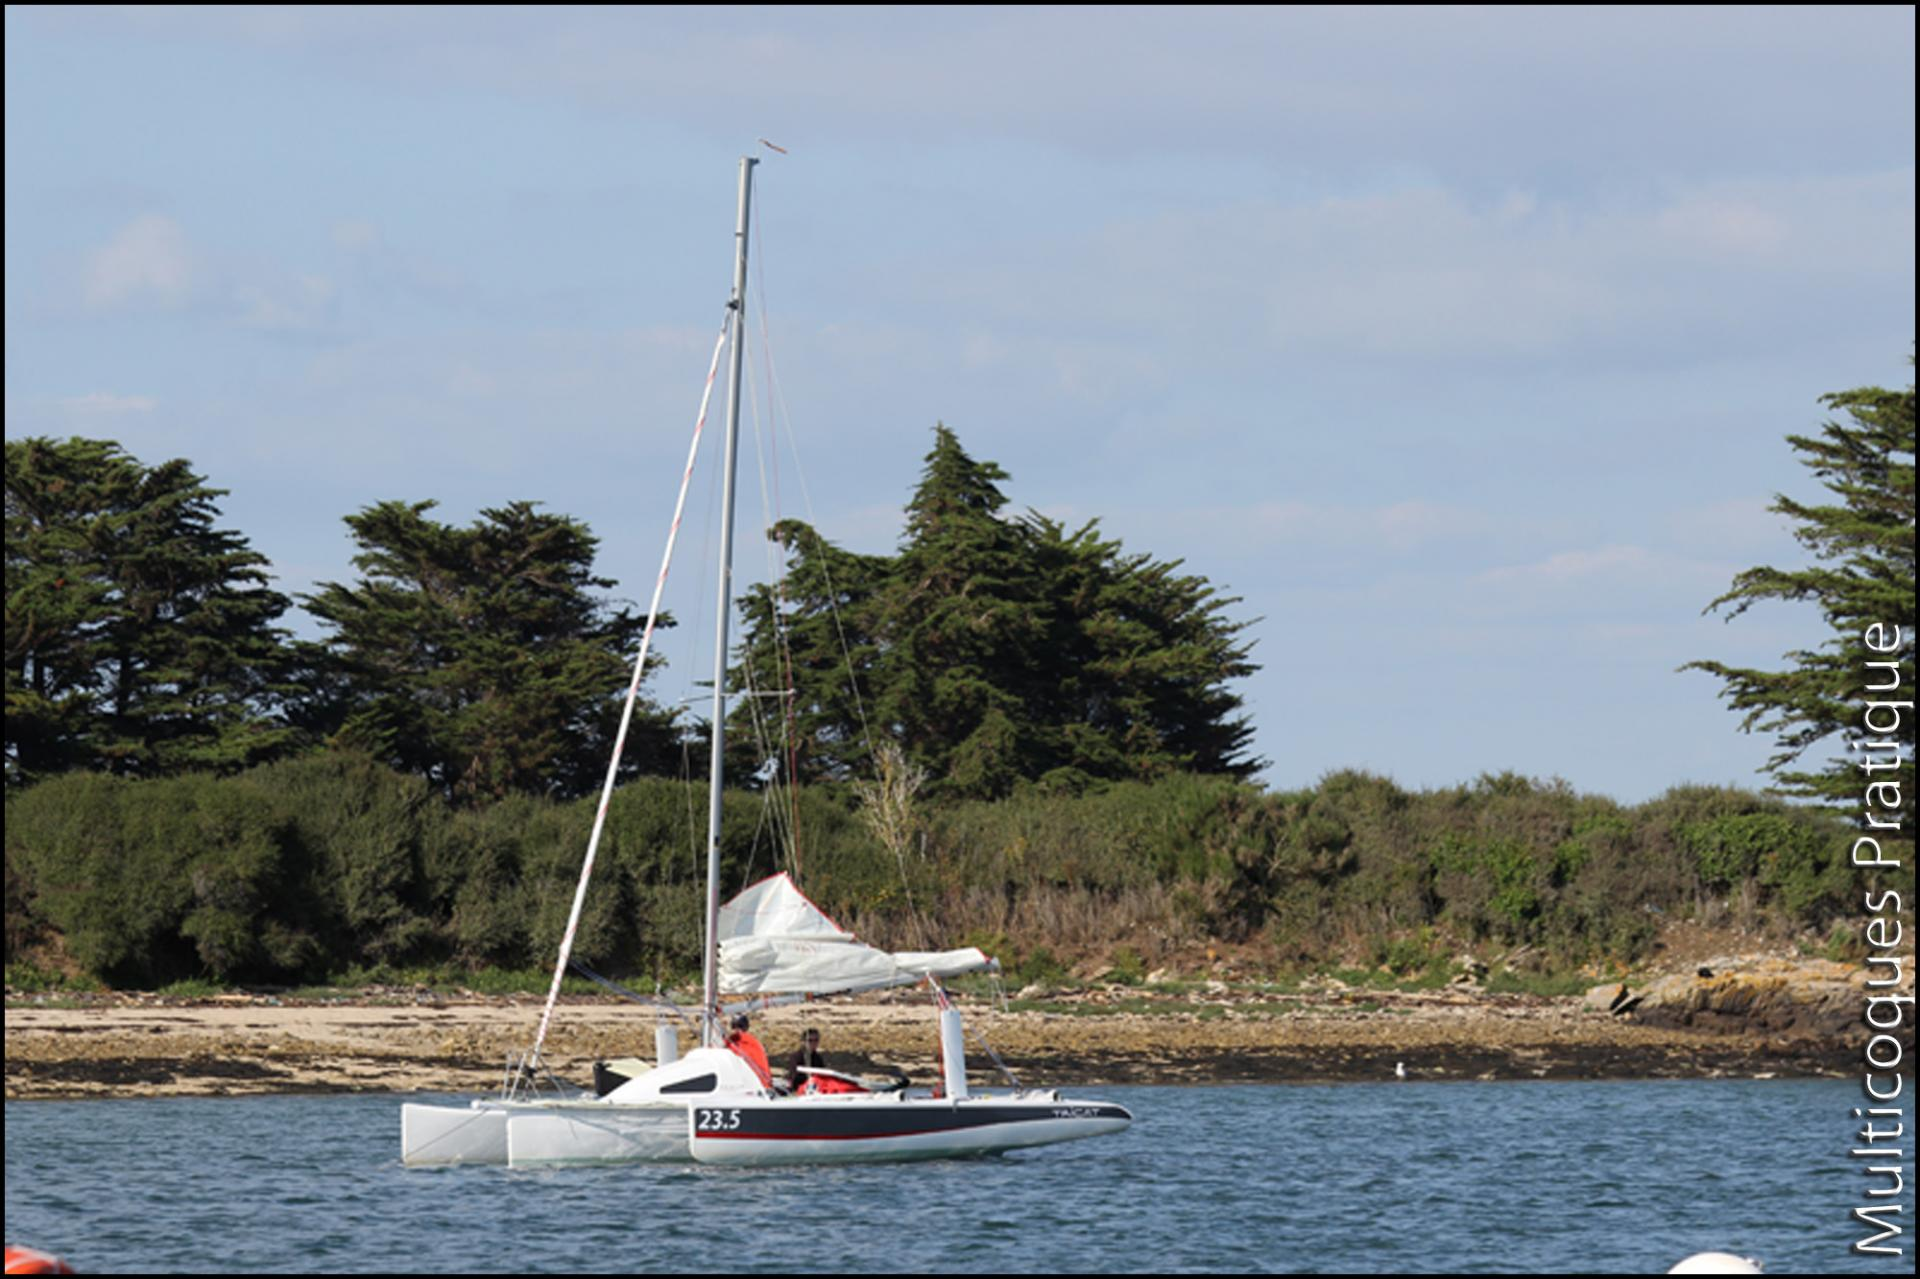 Tricat 23.5 dans le Golfe du Morbihan